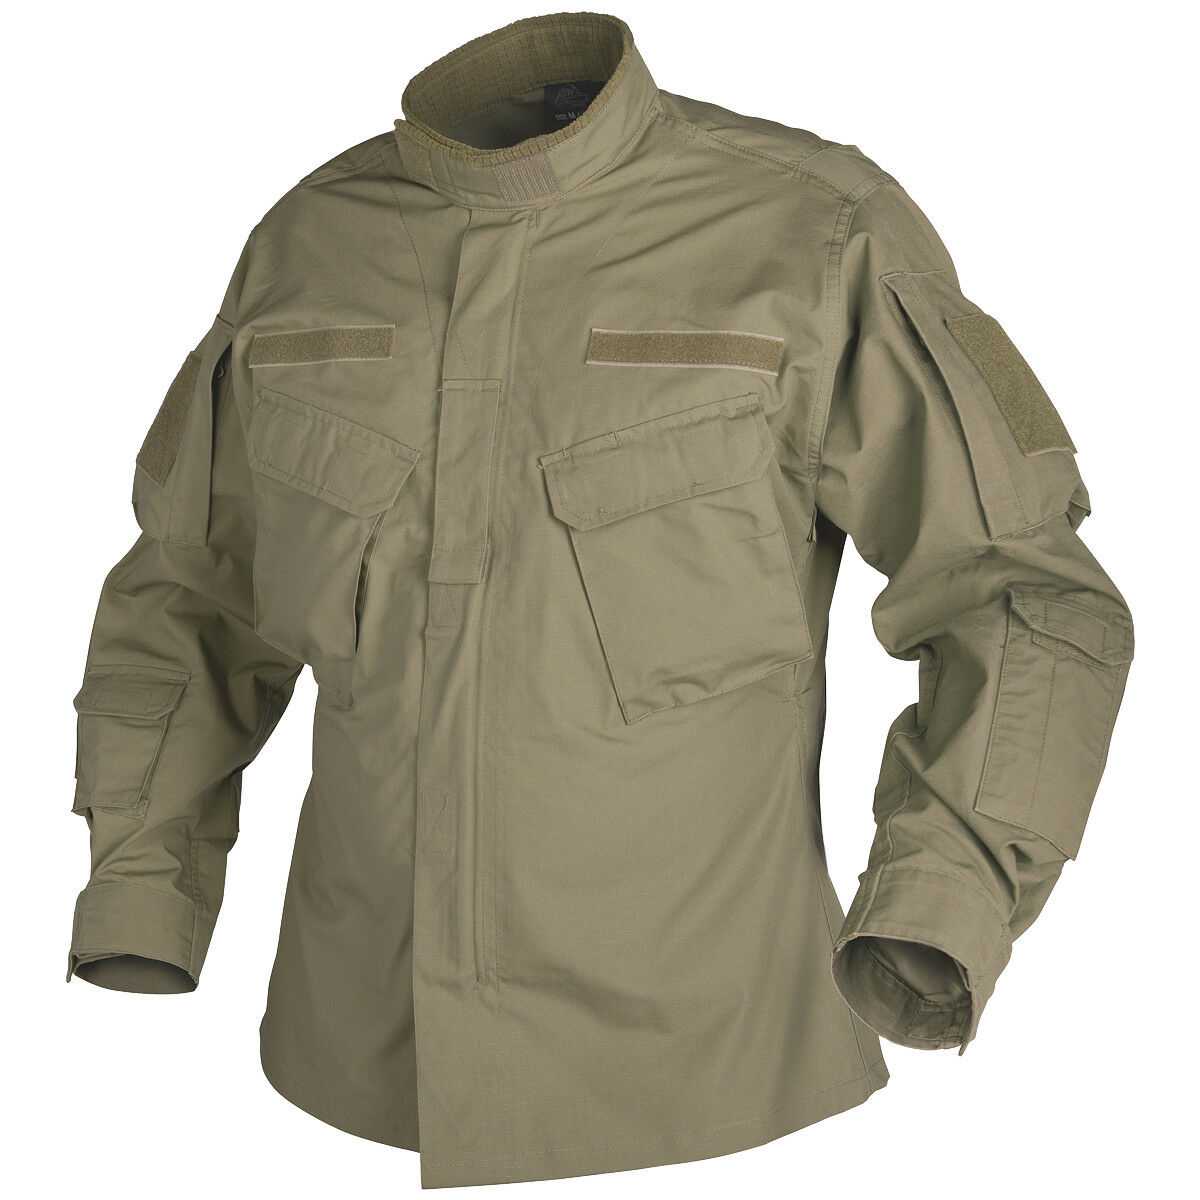 Helikon Helikon Helikon Tattica Army Jacket Cpu Patrol uomo Shirt Airsoft Tiro Coyote Tan 52e728